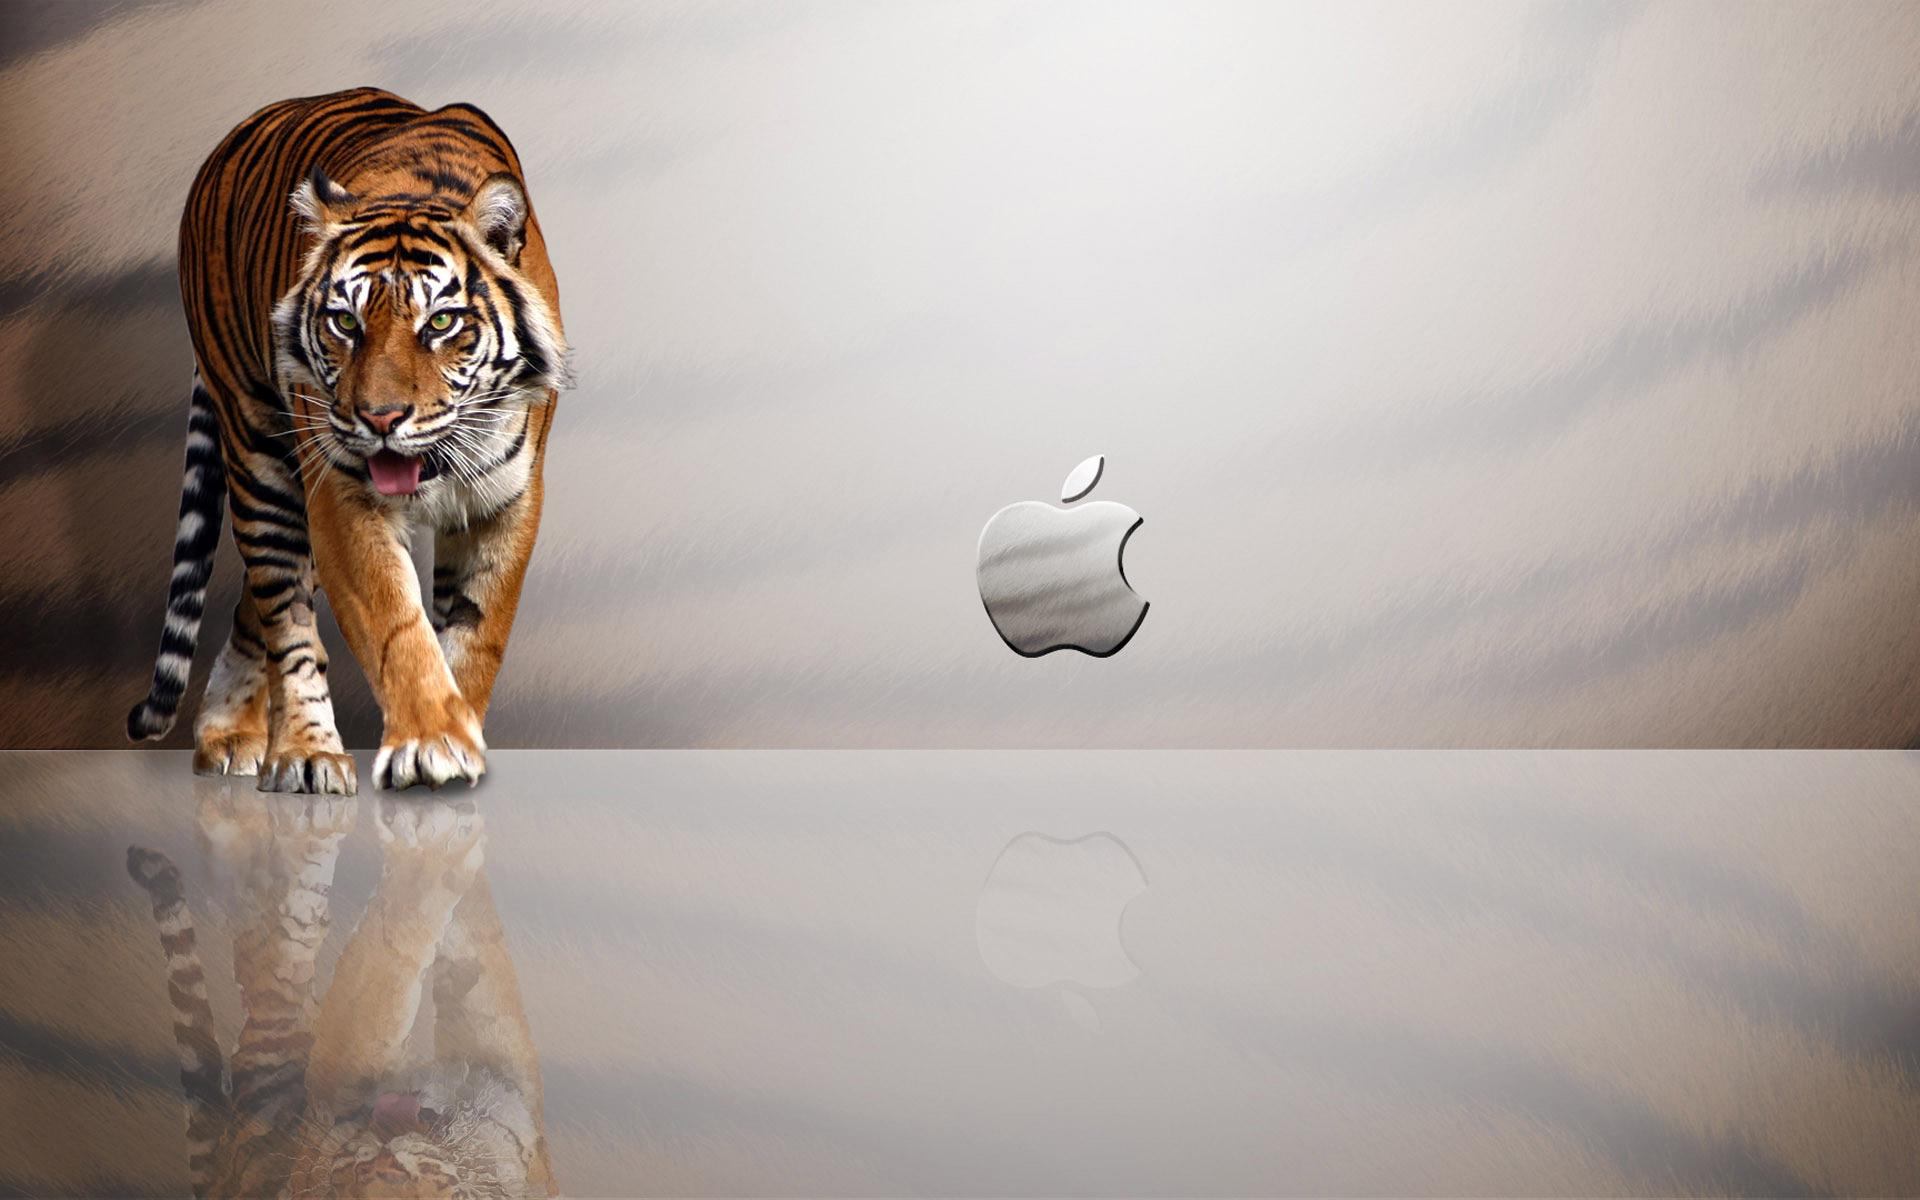 comApple Tiger Mac OS desktop hd wallpaper High Quality Wallpapers 1920x1200